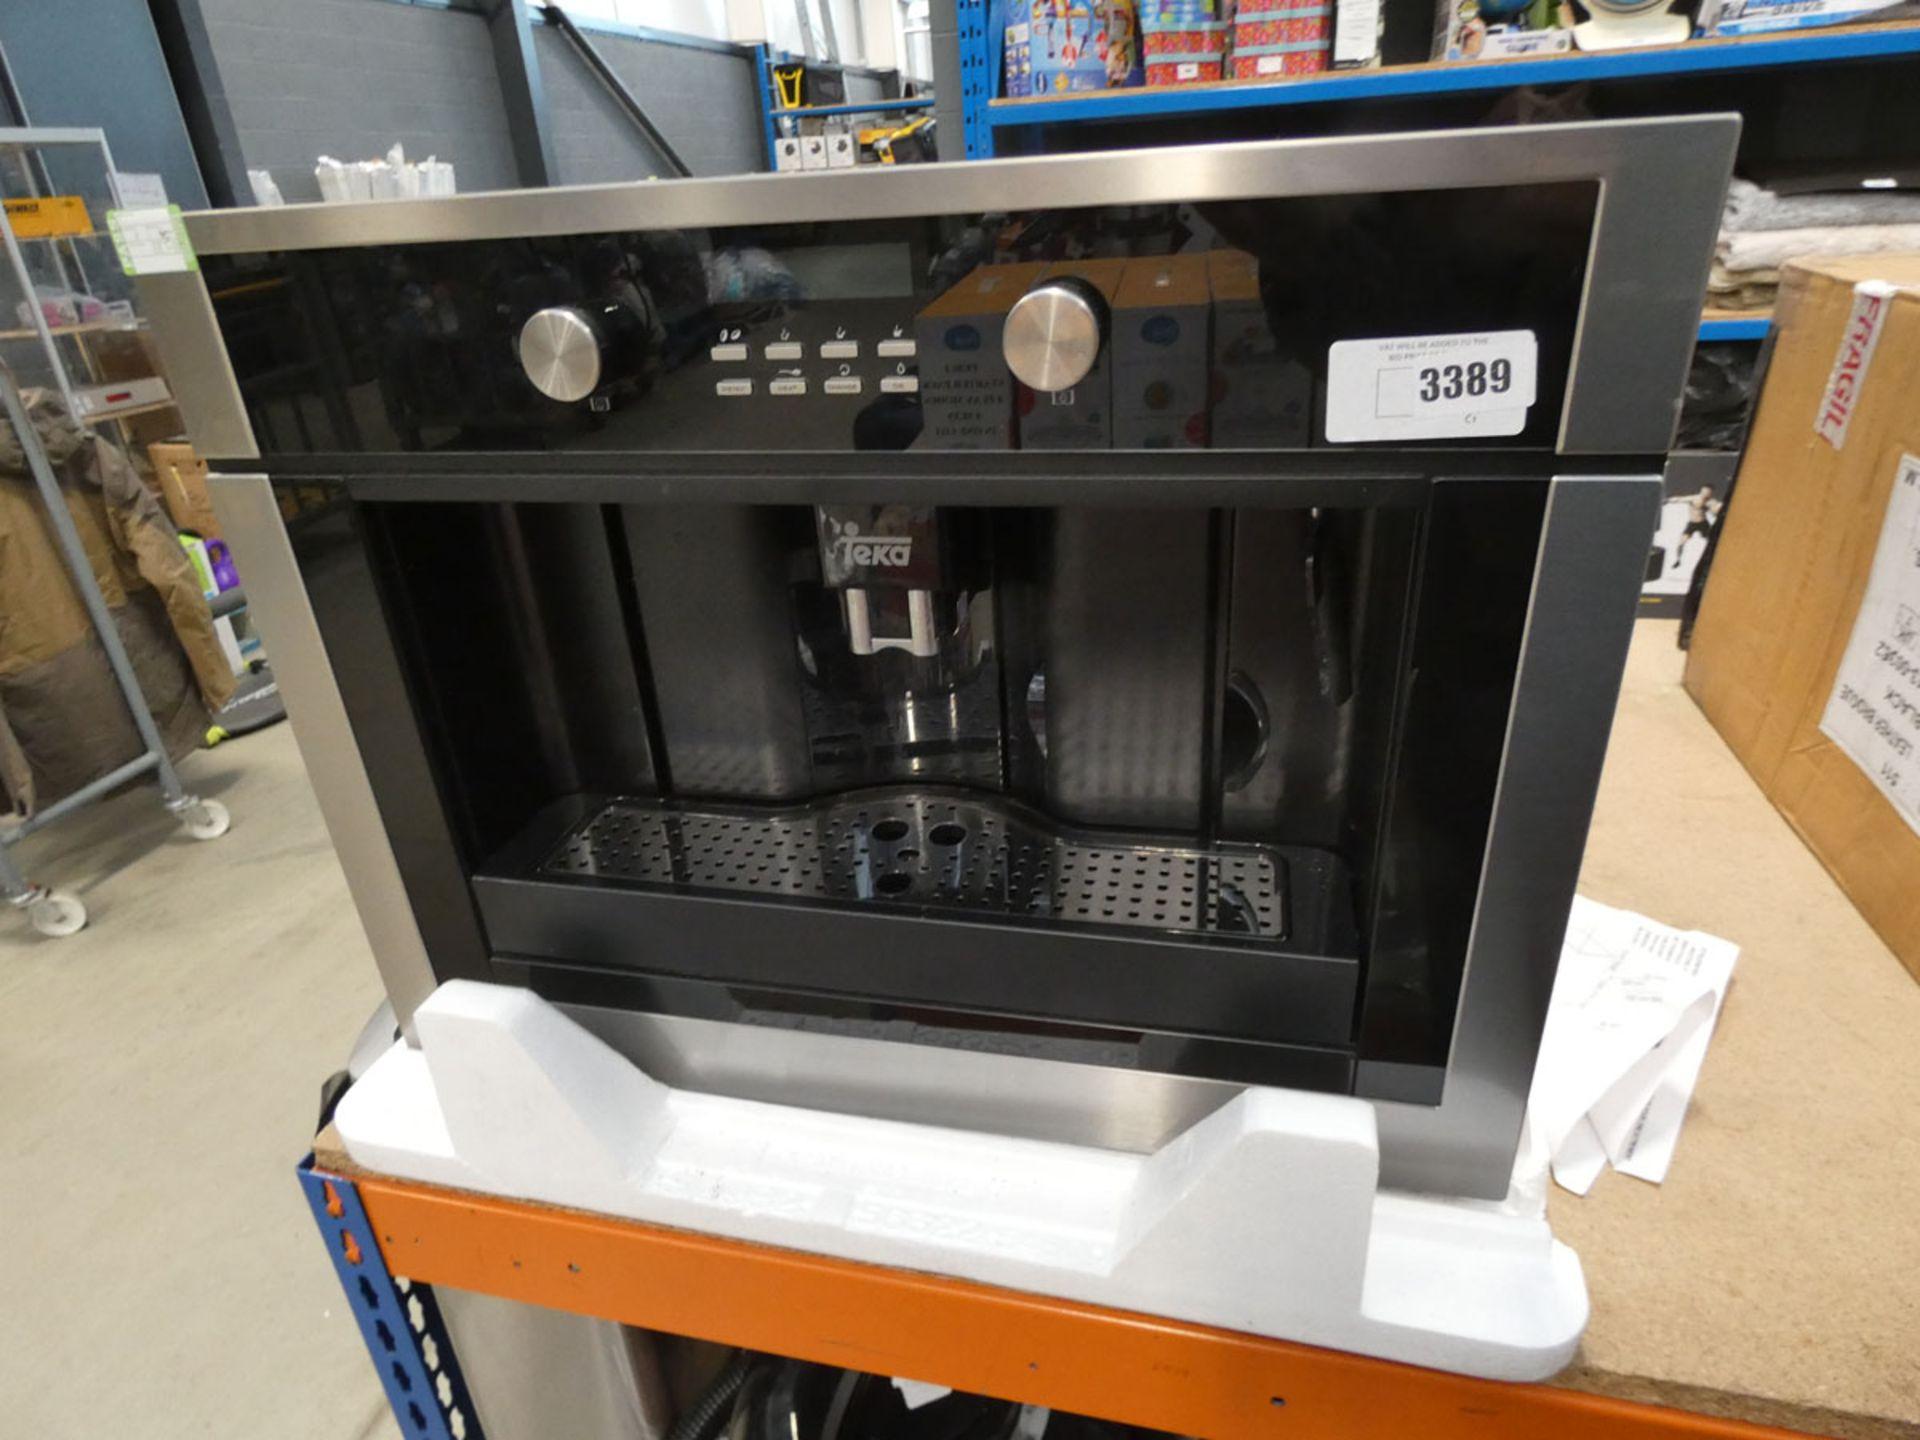 Commercial Tecca coffee machine - no power supply